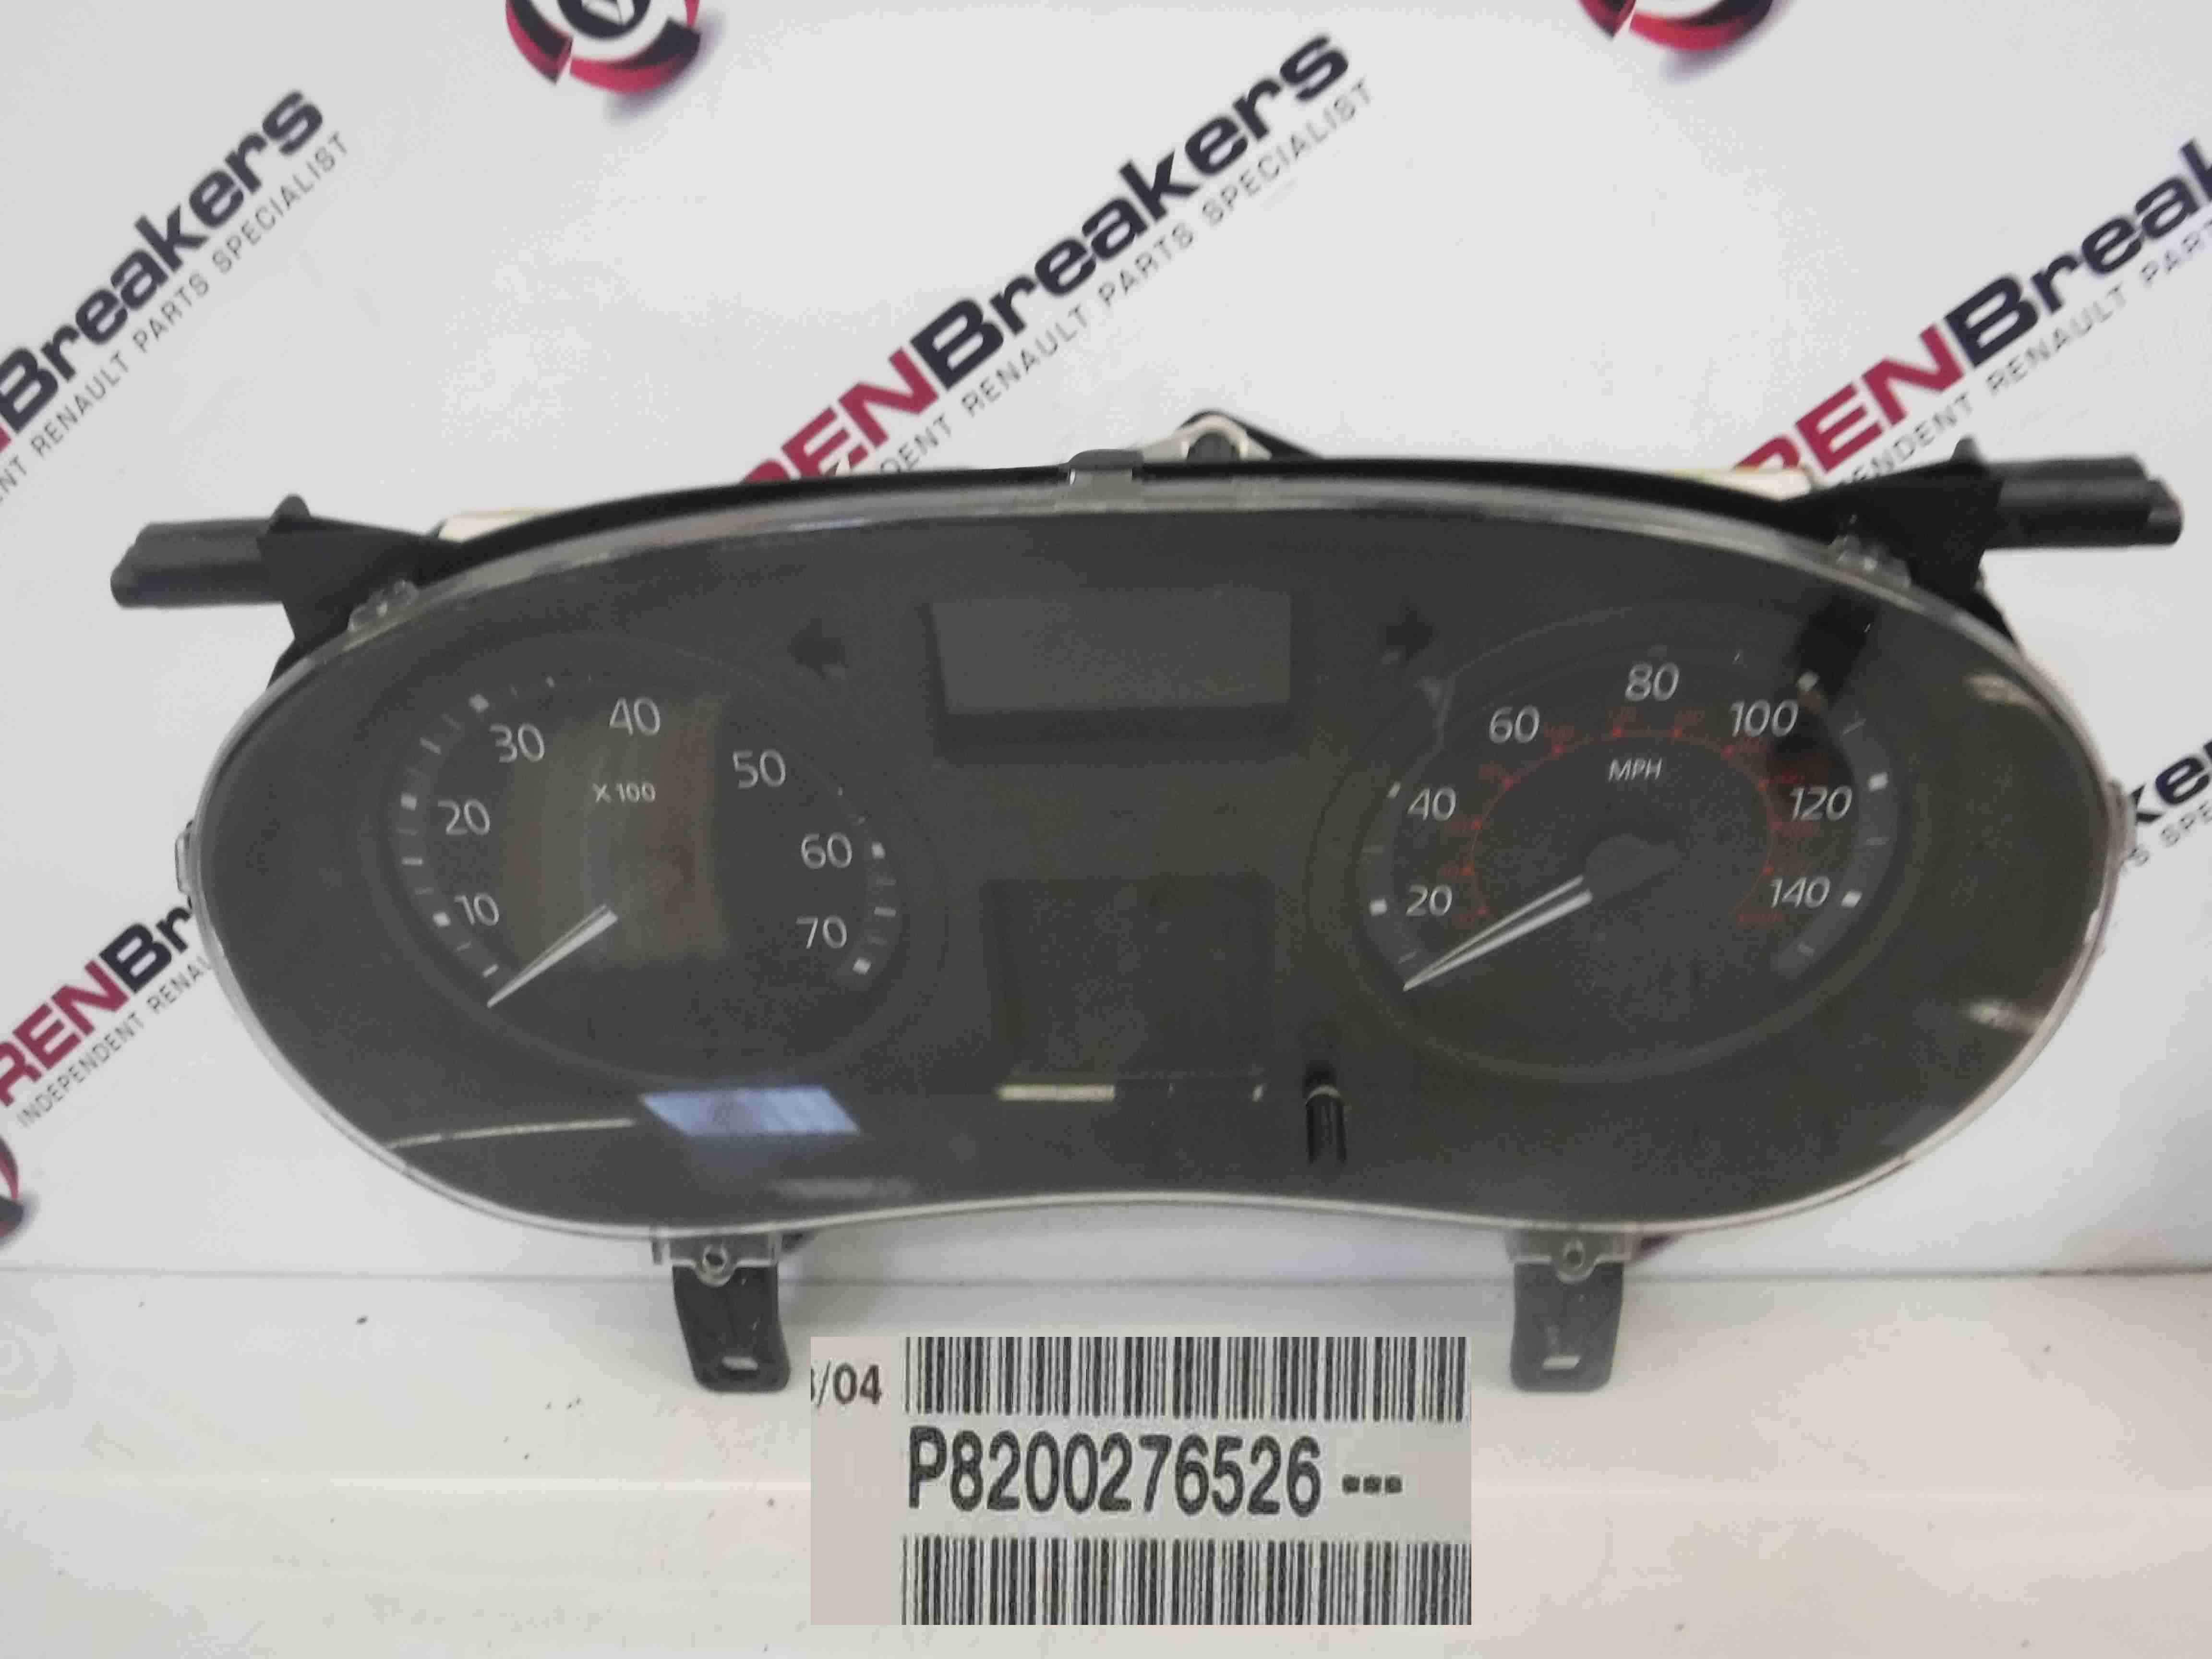 Renault Clio MK2 2001-2006 Instrument Panel Dials Gauges Clocks 117K 8200276526